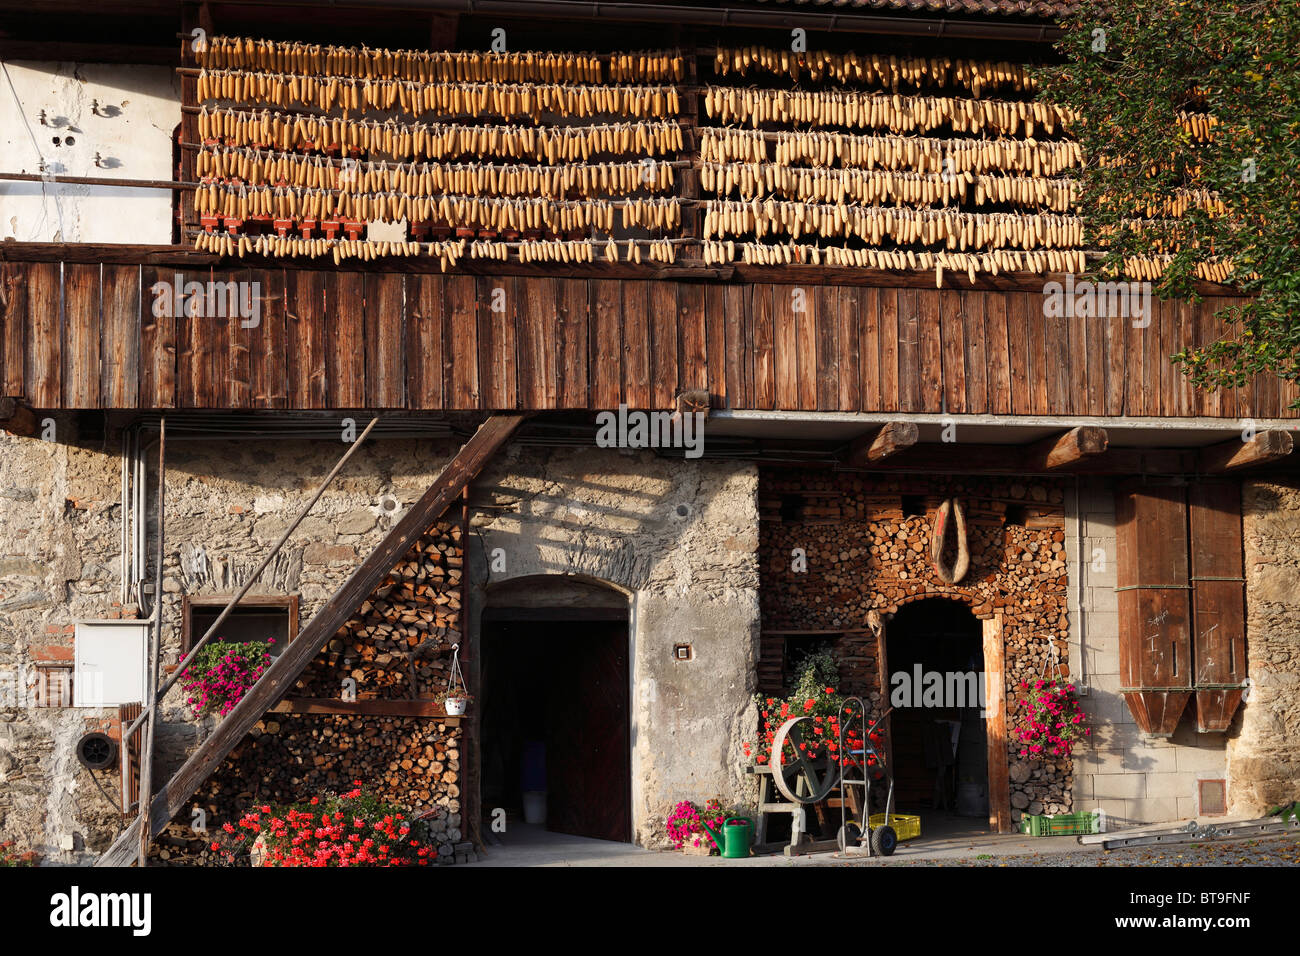 Old Liendl farm, suspended corn, Keutschach am See, Carinthia, Austria, Europe - Stock Image